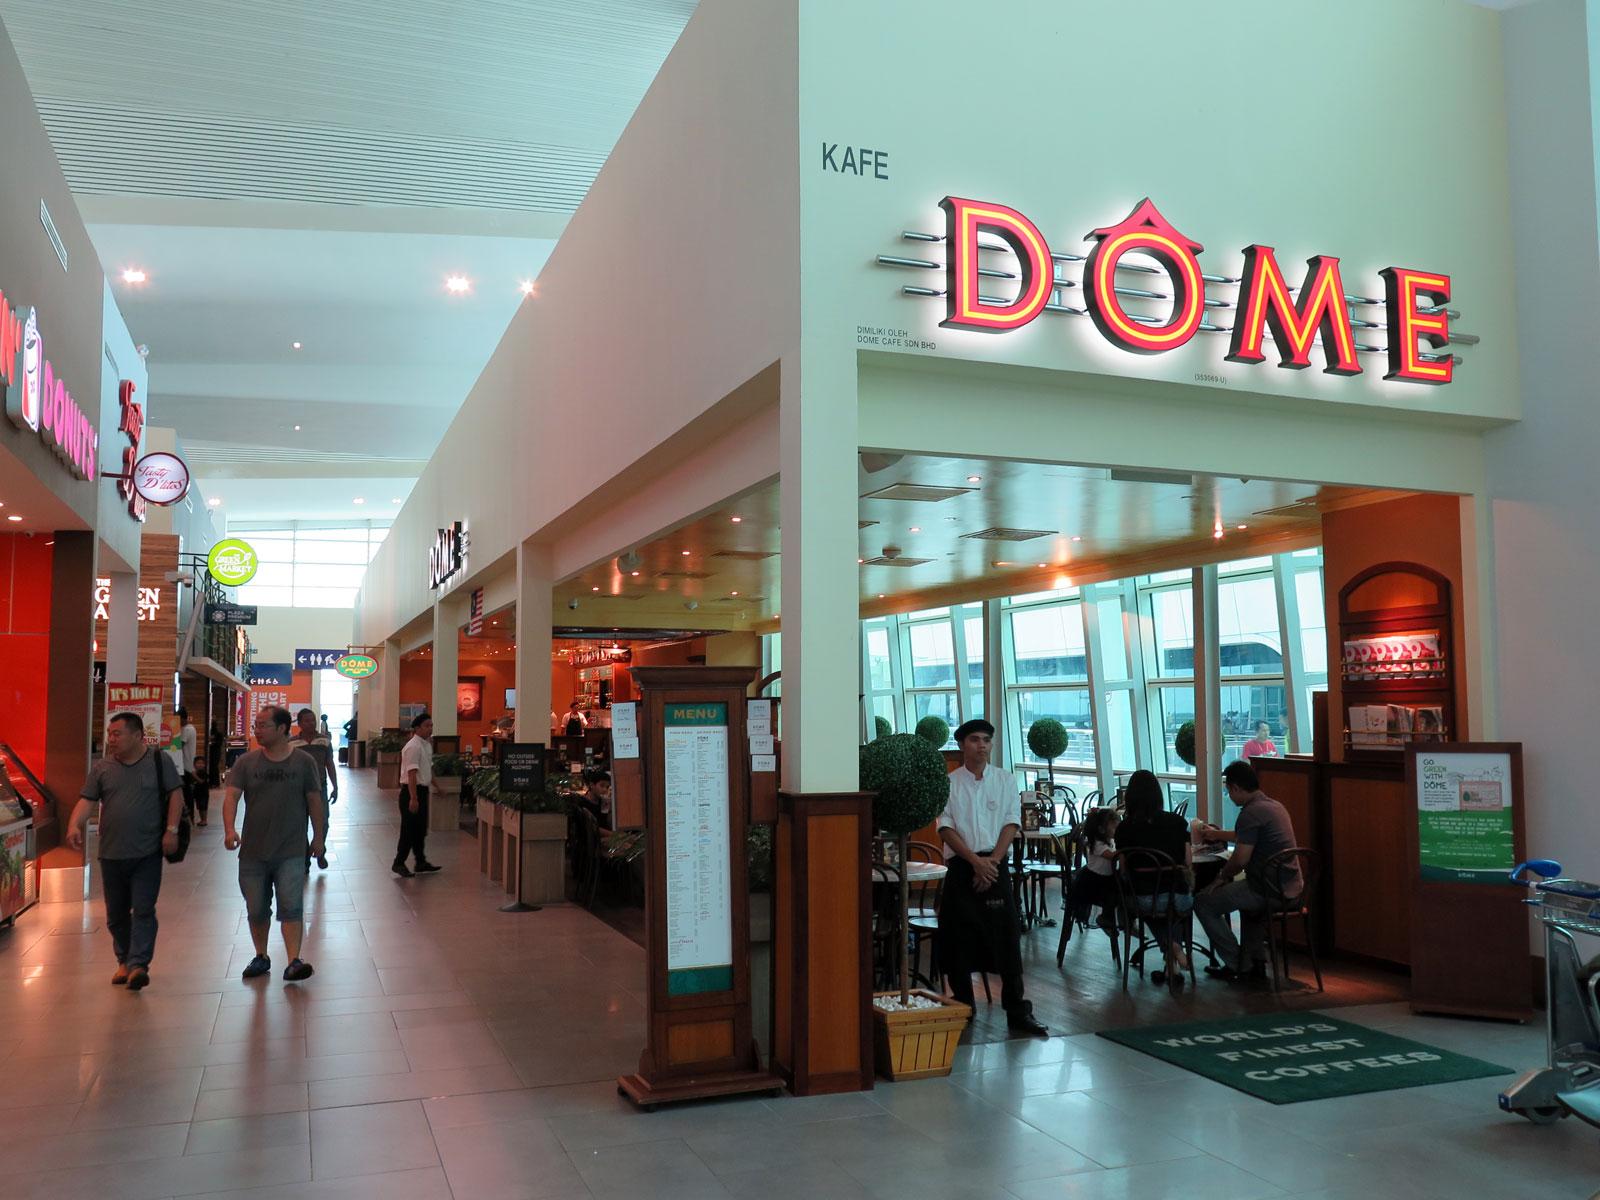 dome cafe Dome - burjuman centre dubai dome - burjuman centre, mankhool get menu, reviews, contact, location, phone number, maps and more for dome - burjuman centre restaurant on zomato serves cafe, desserts.